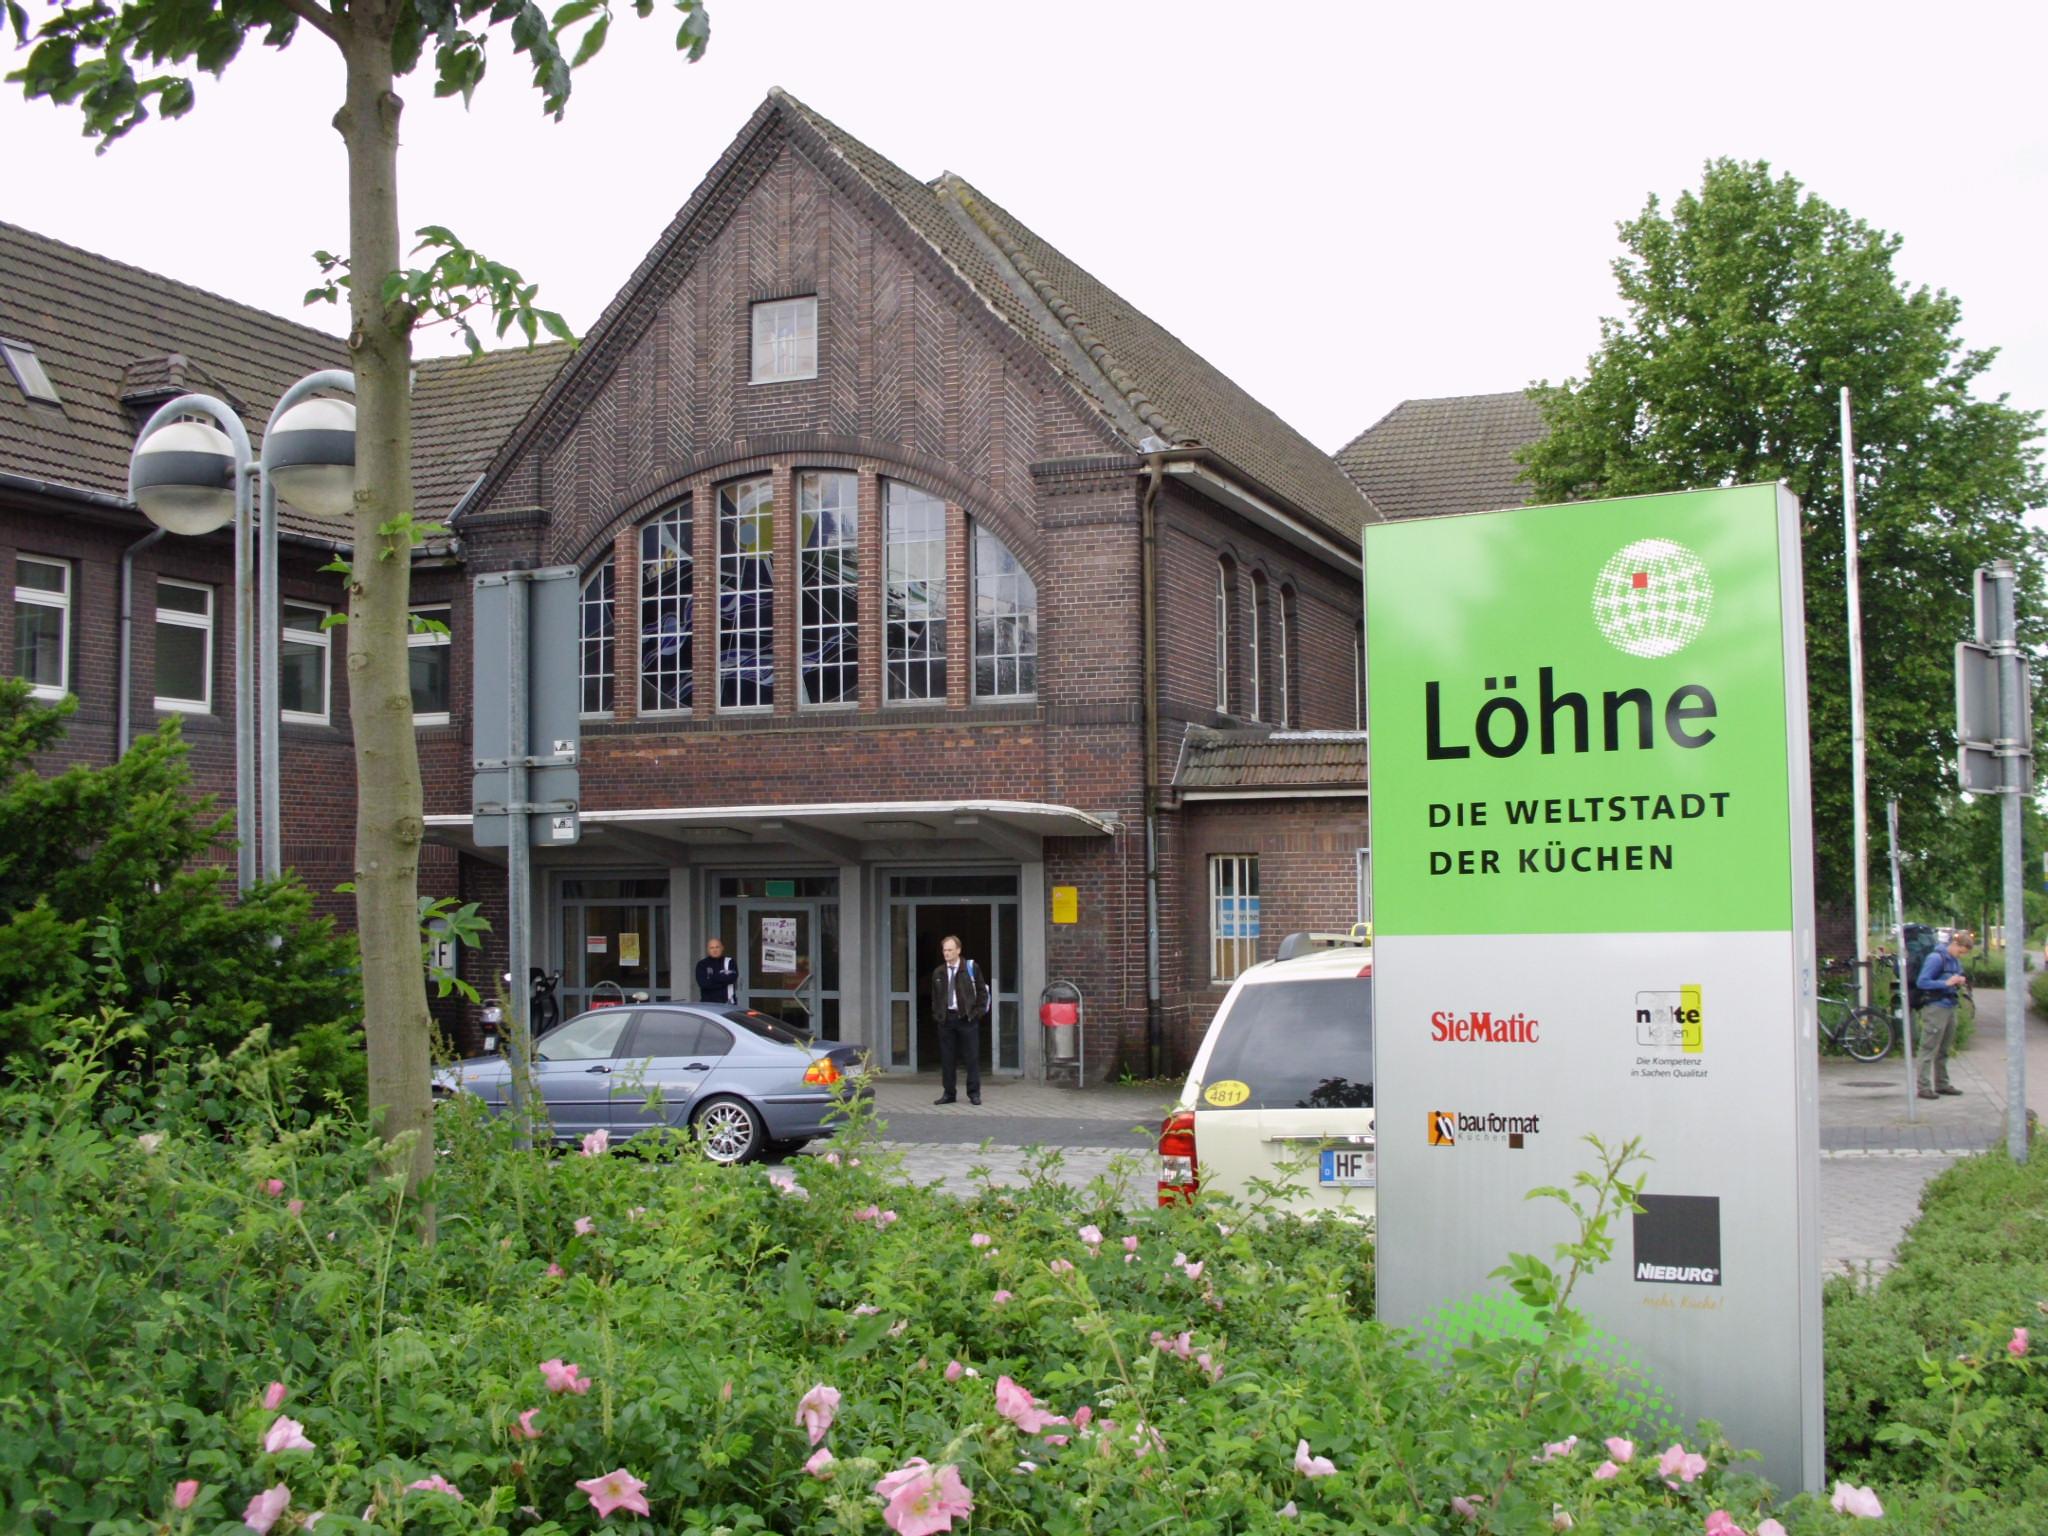 Bahnhof L Hne file haupteingang des bahnhofs löhne westf jpg wikimedia commons